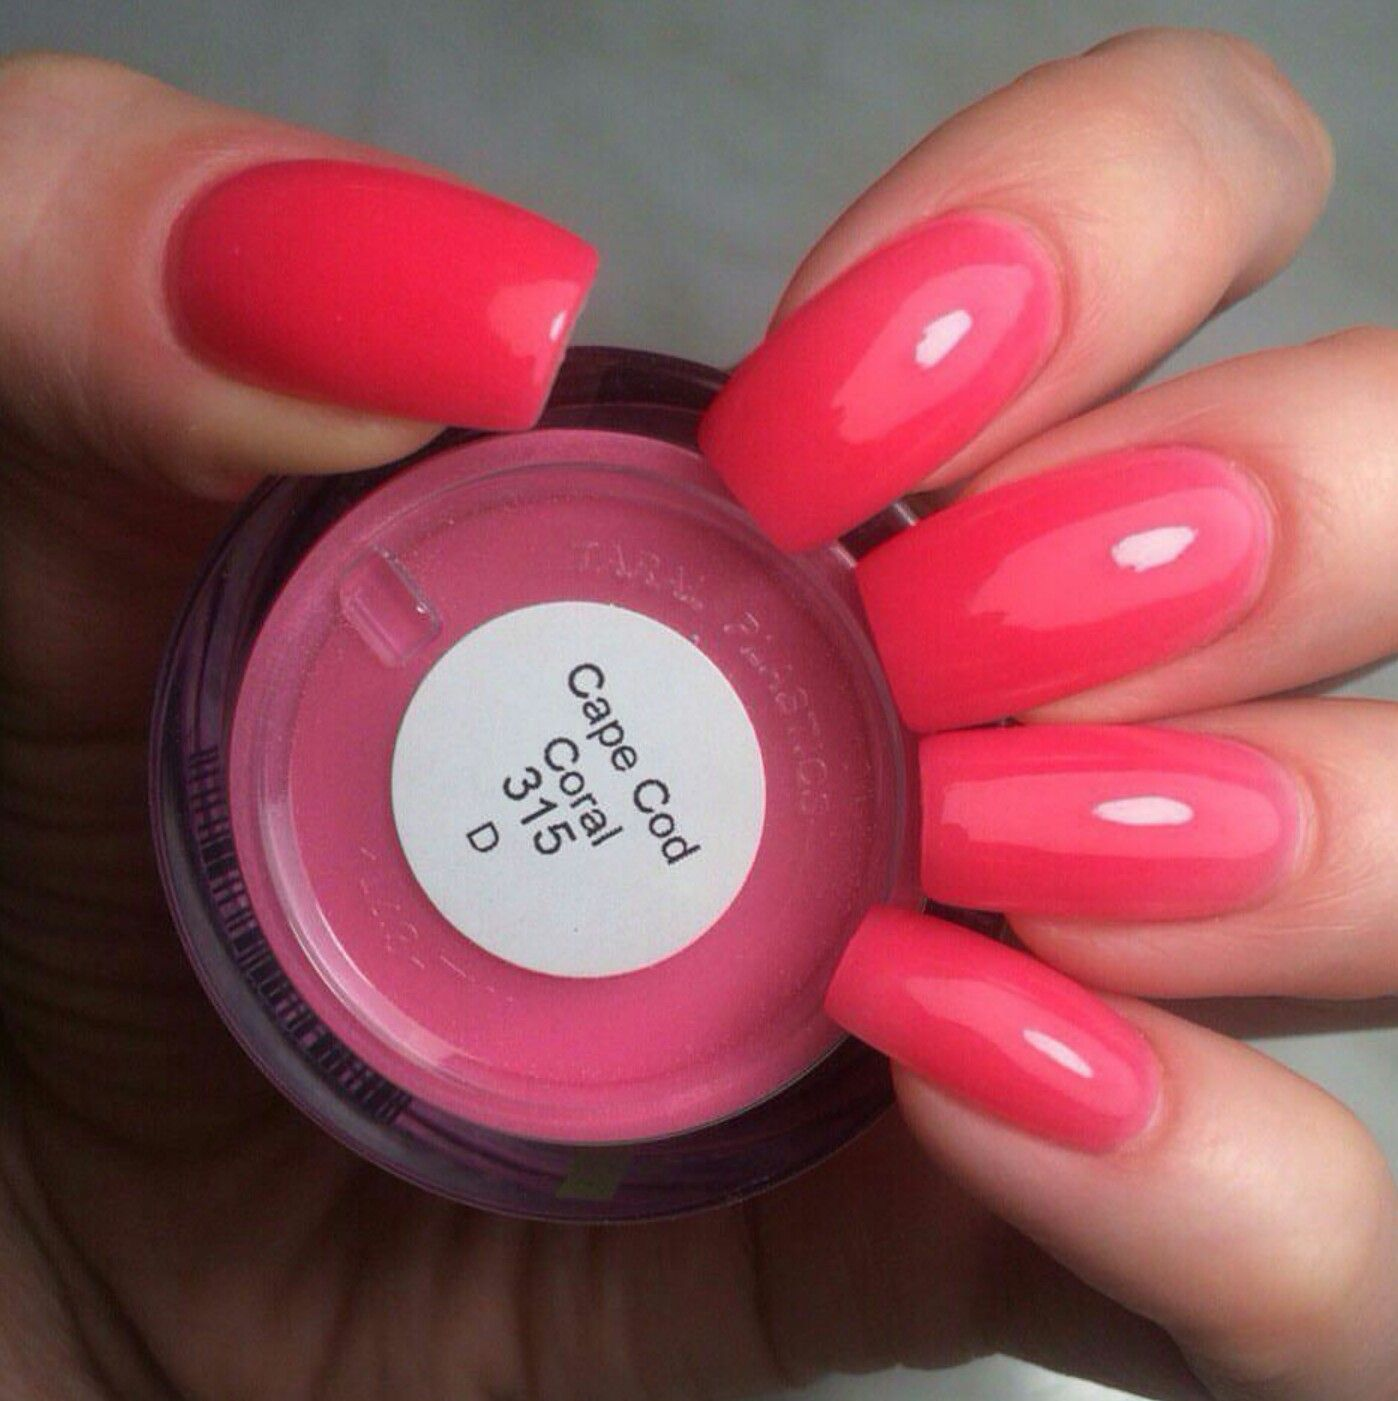 Pinterest: @NewWaves | Nails | Pinterest | Sns nails, Dipped nails ...